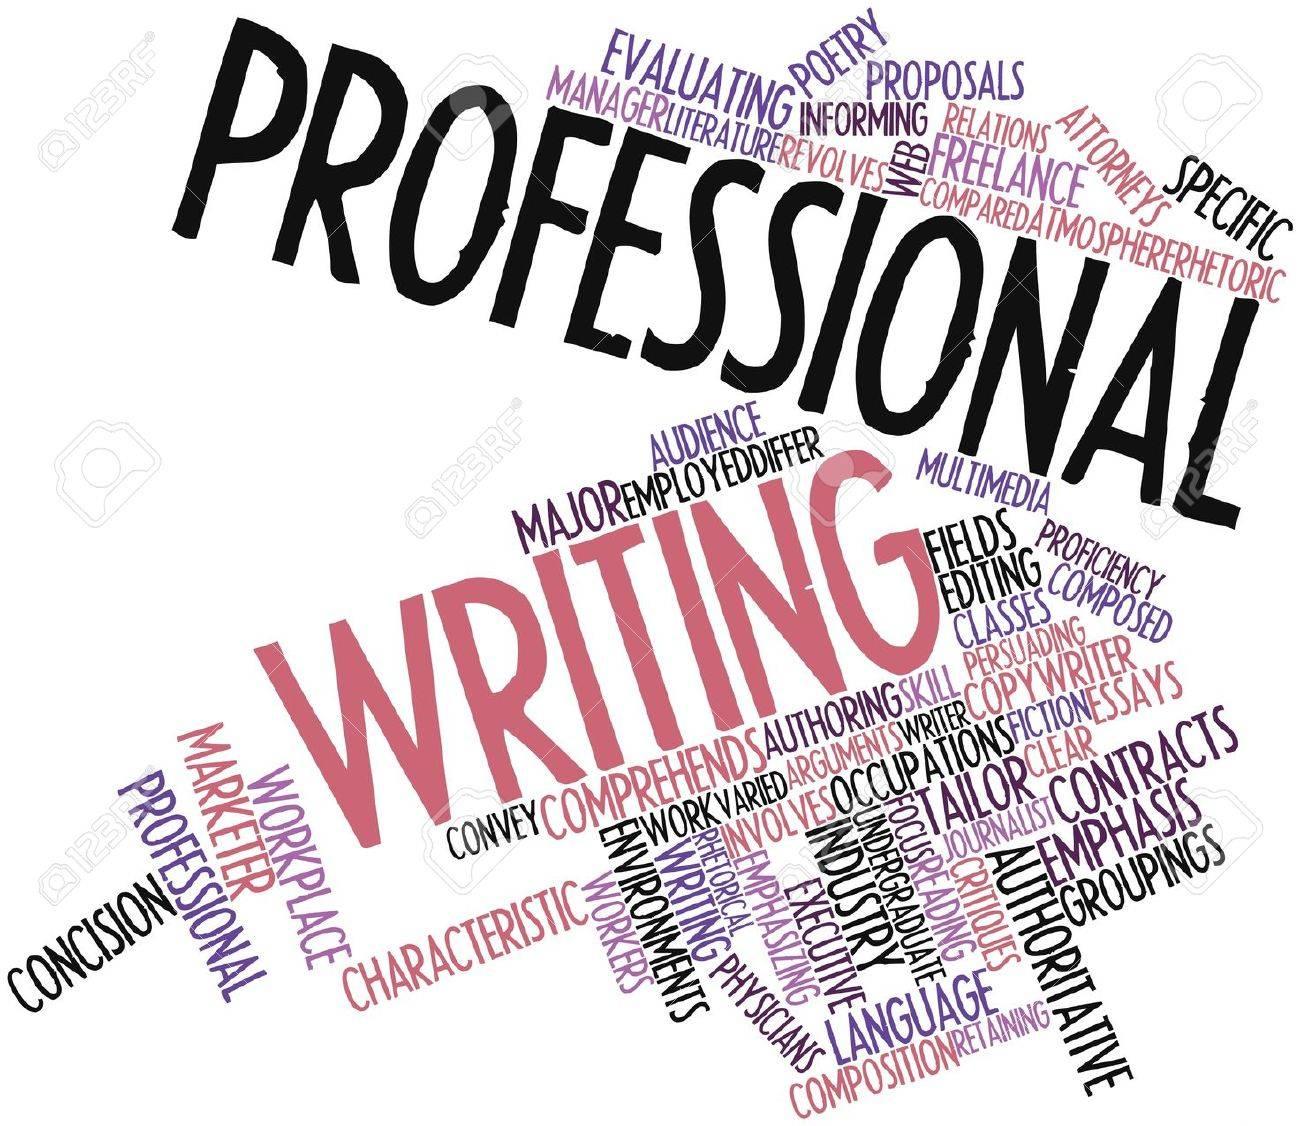 University of minnesota duluth creative writing